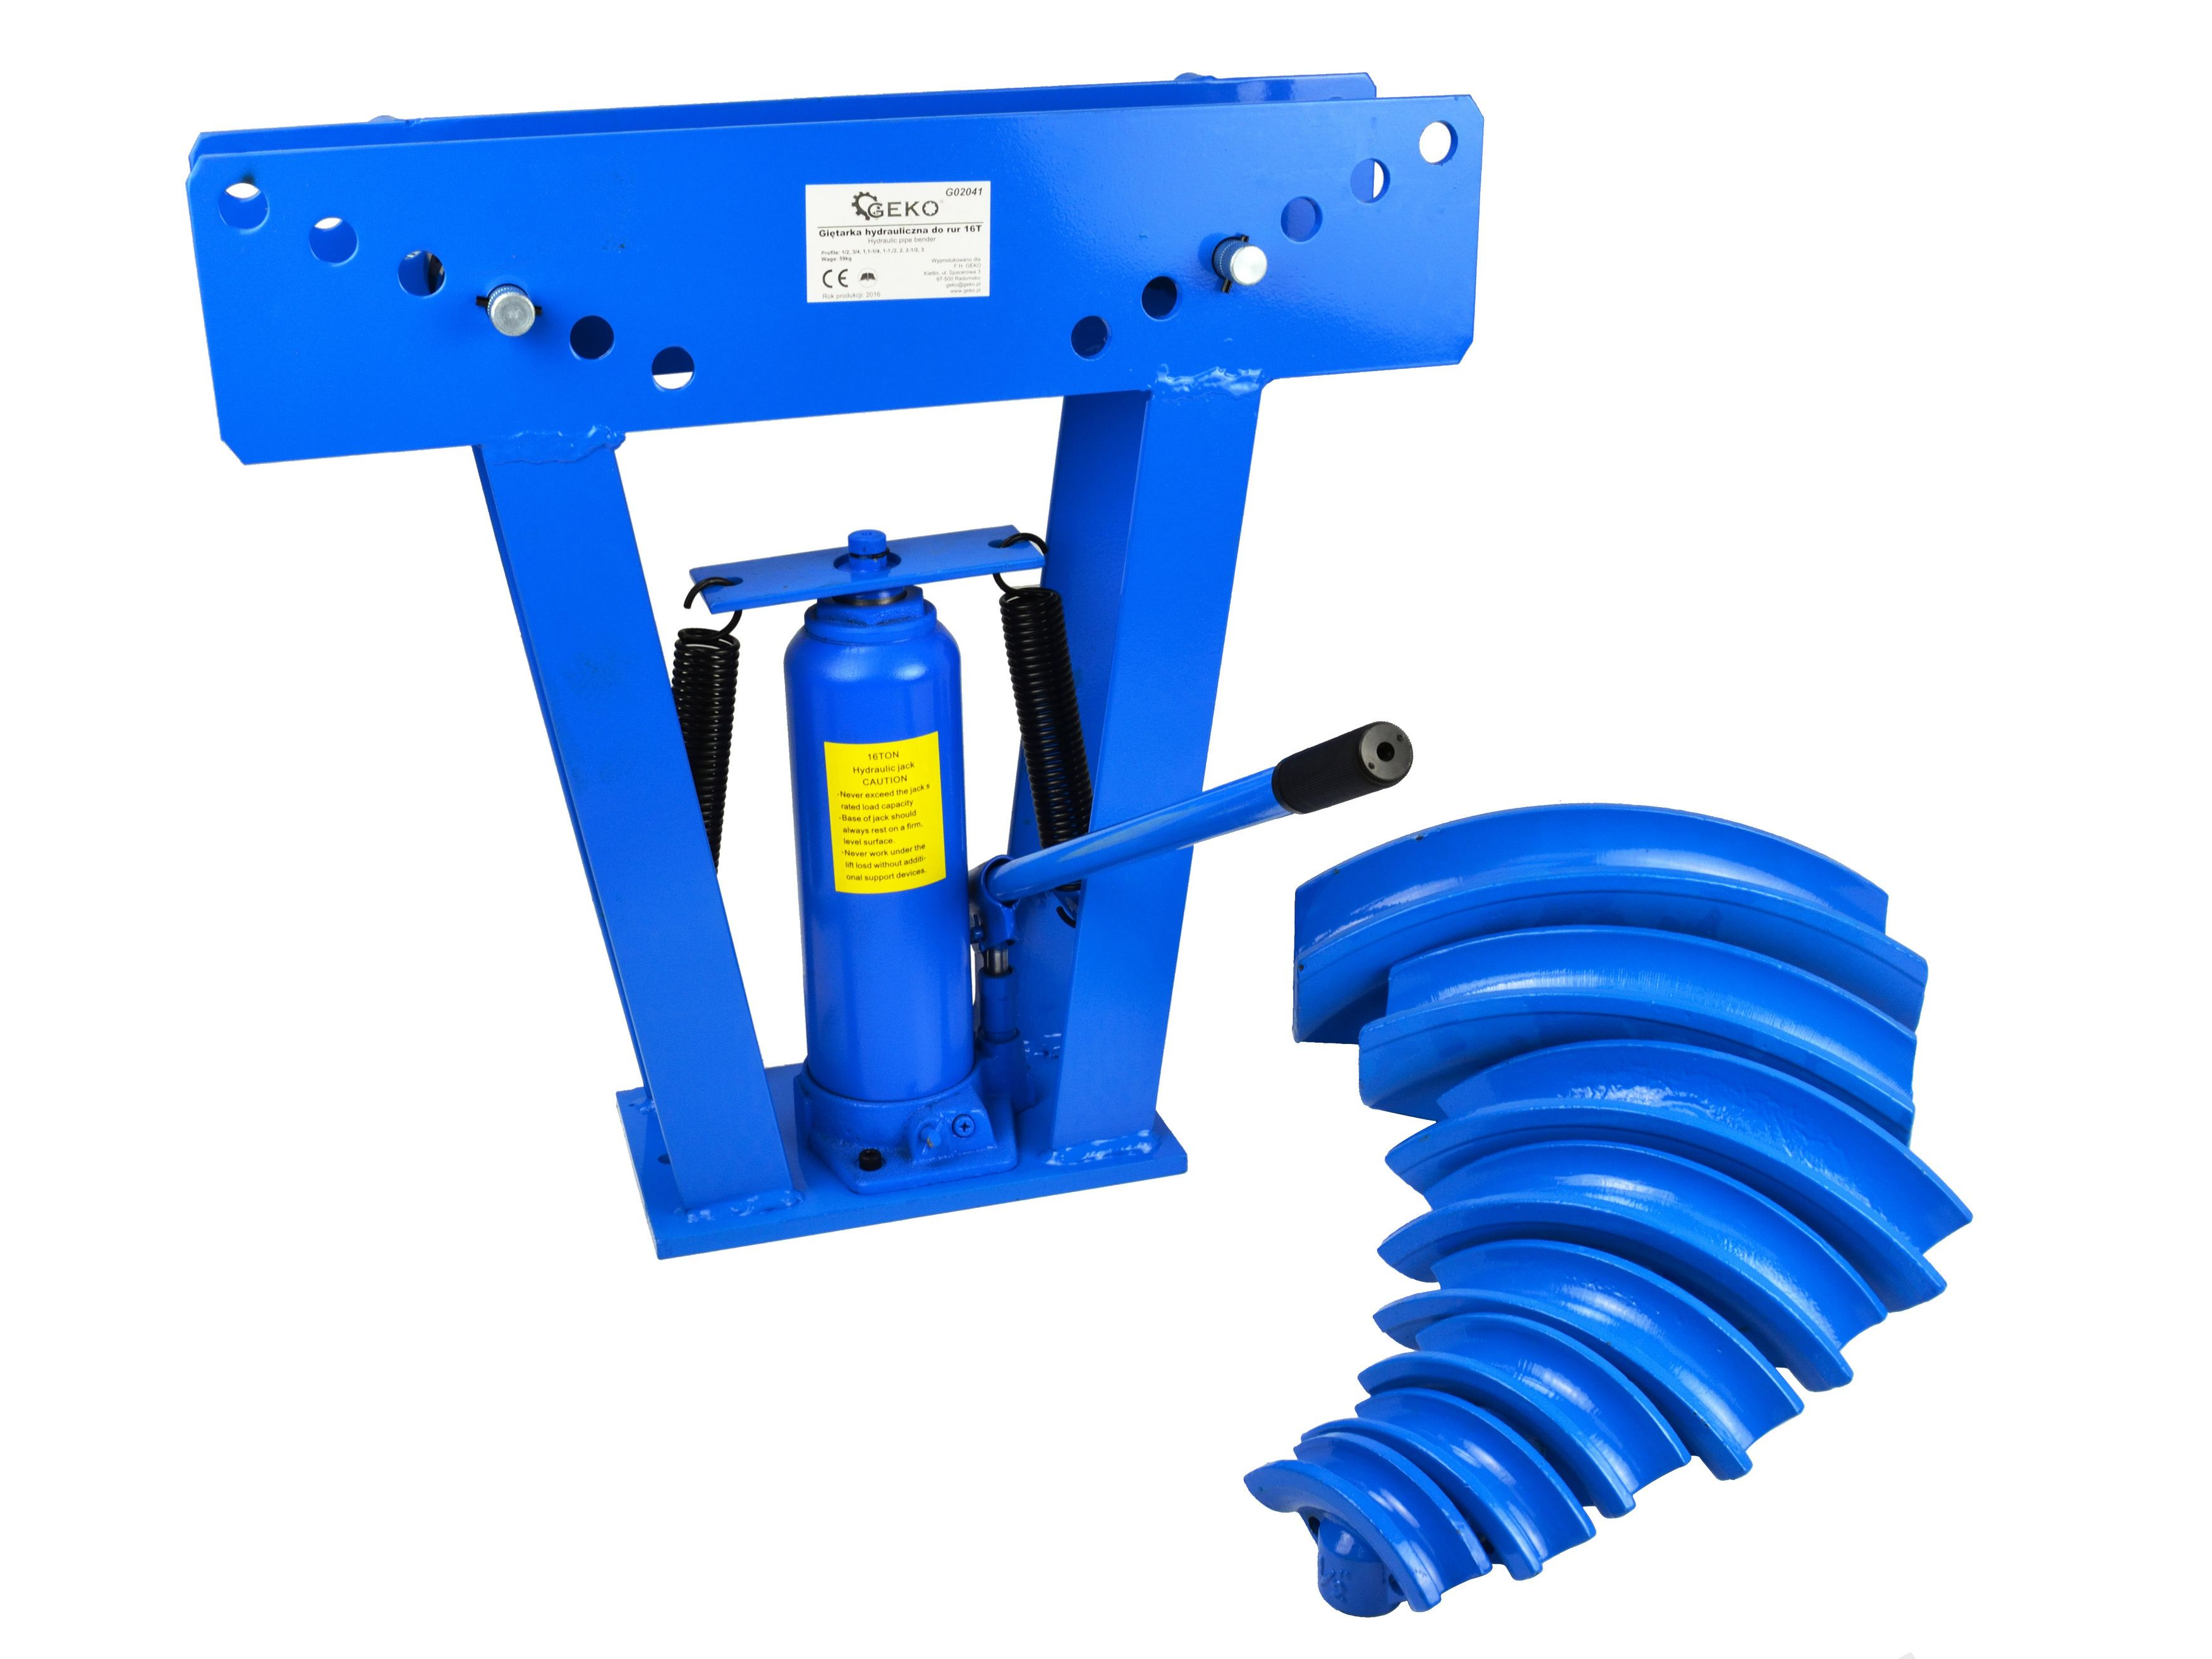 Hydraulická ohýbačka potrubí, 16T, GEKO, 2 krabice